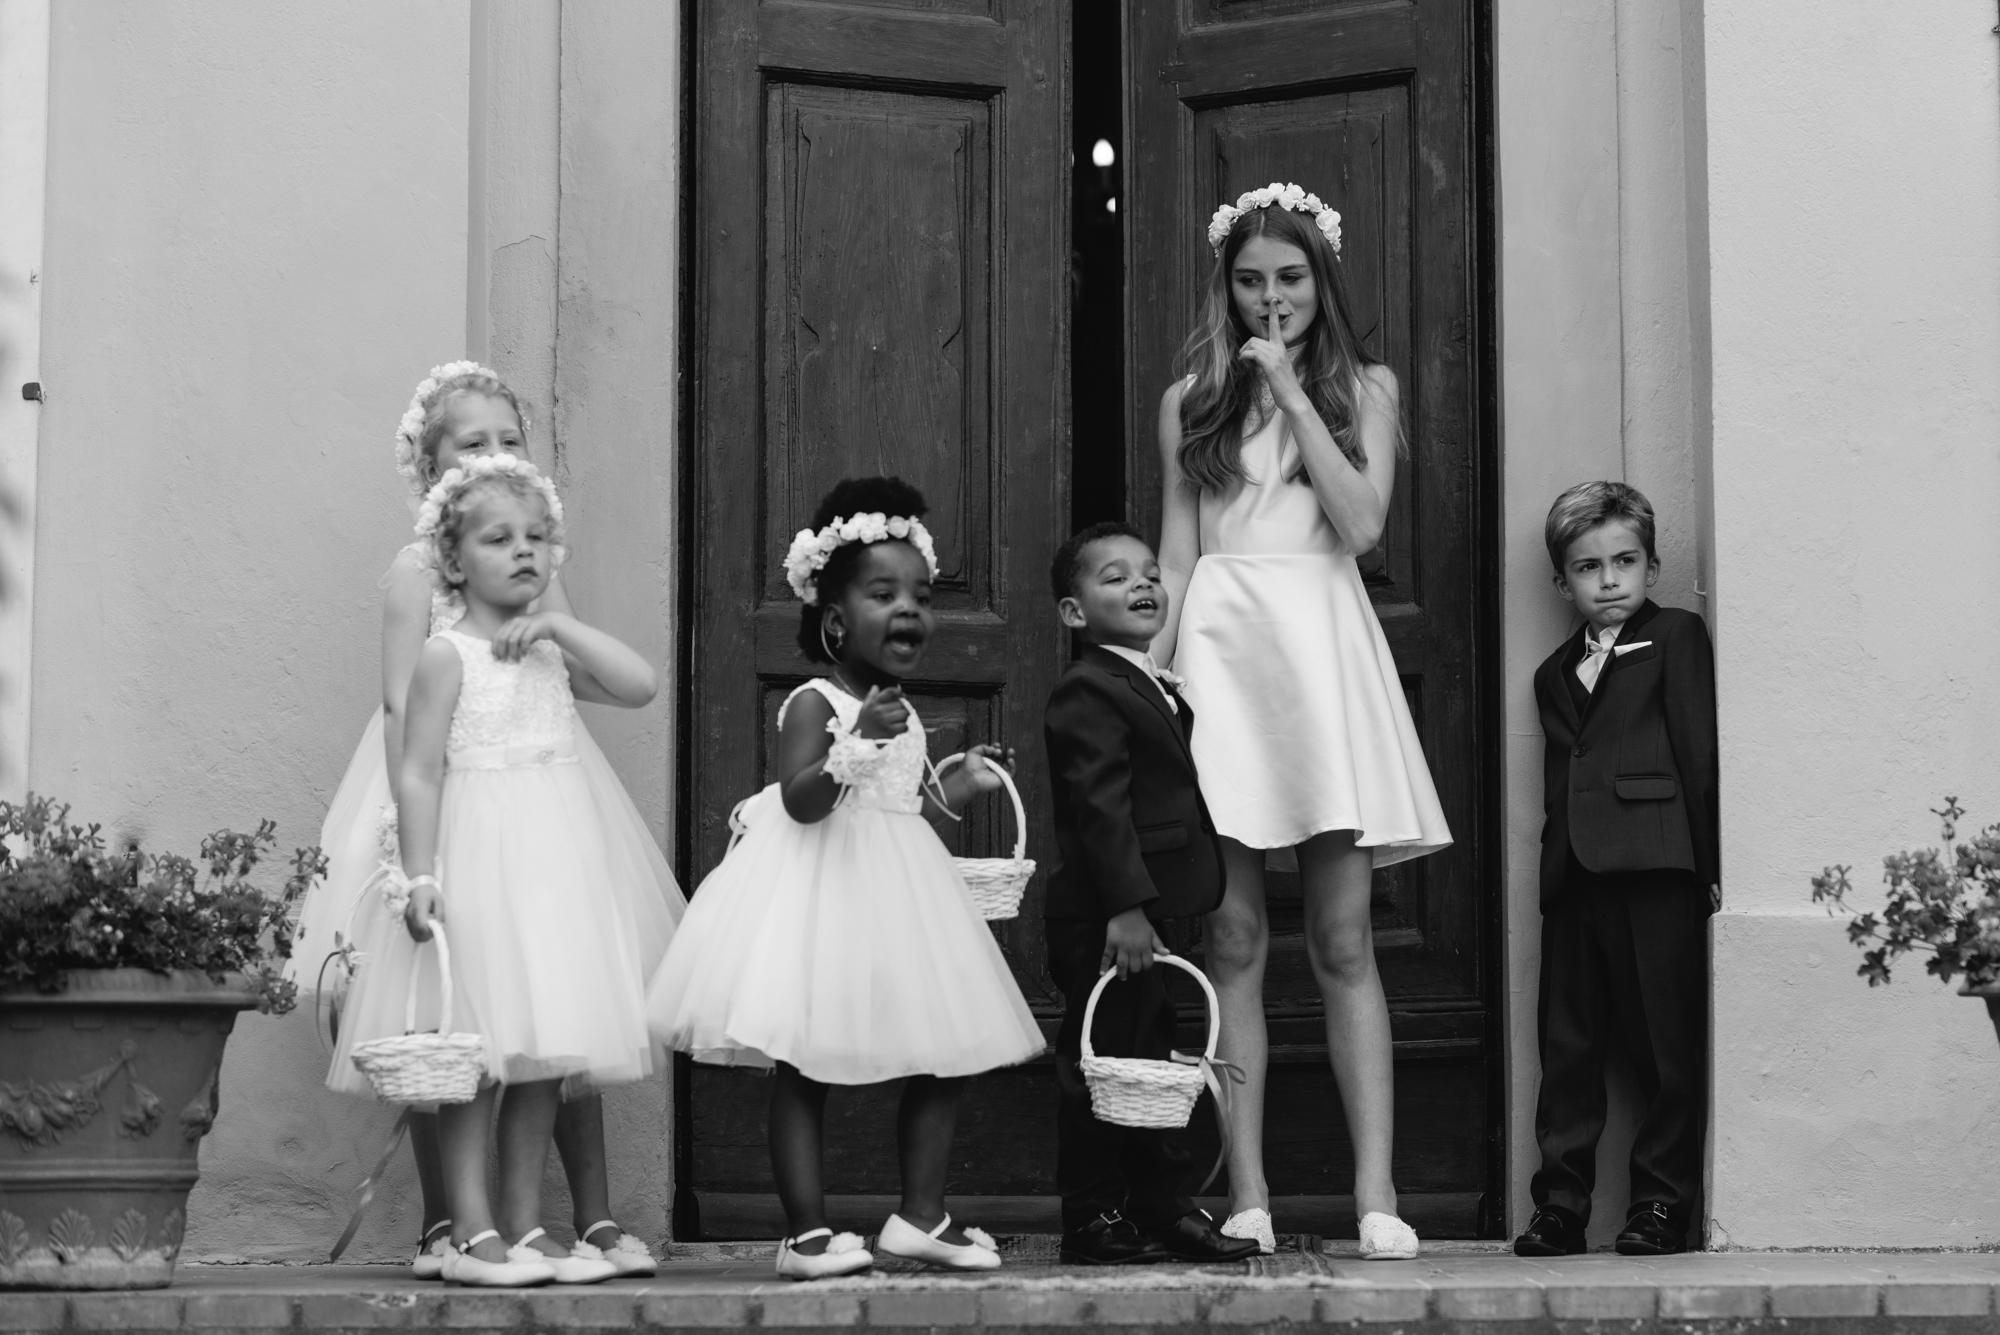 Wedding_Photographer_in_Tuscany_Italy-034.jpg